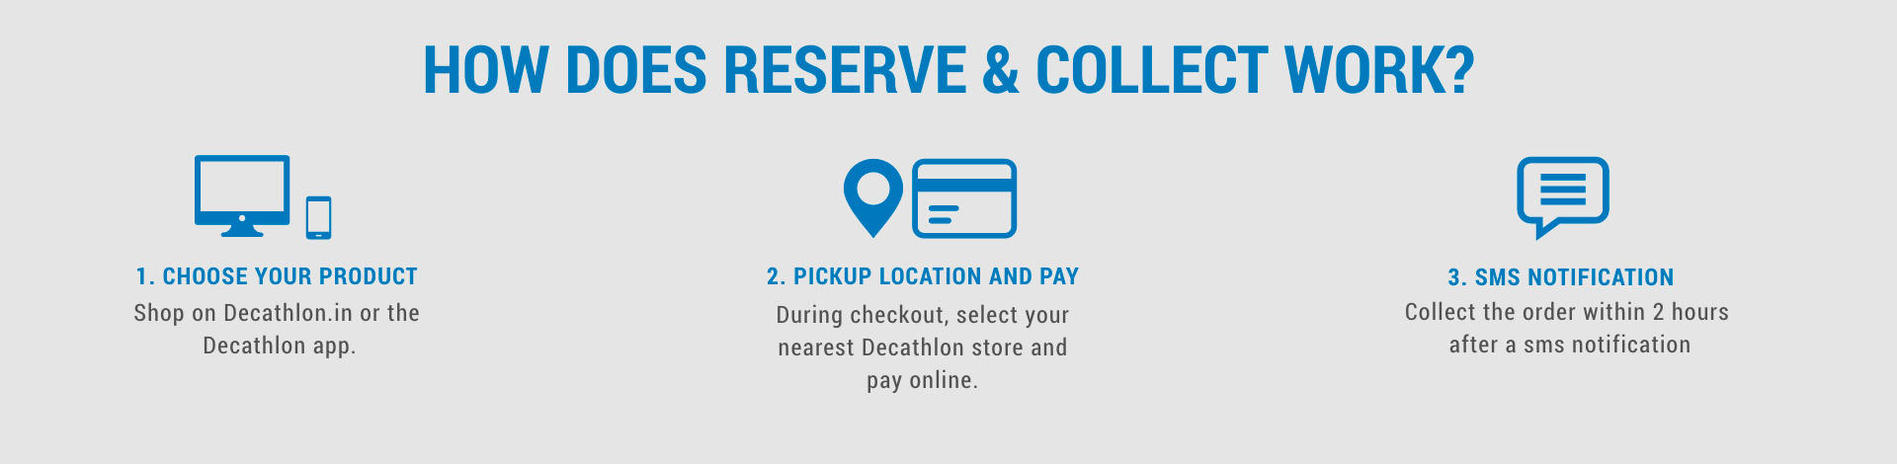 Decathlon Drive Thru Details, Decathlon Reserve and Collect